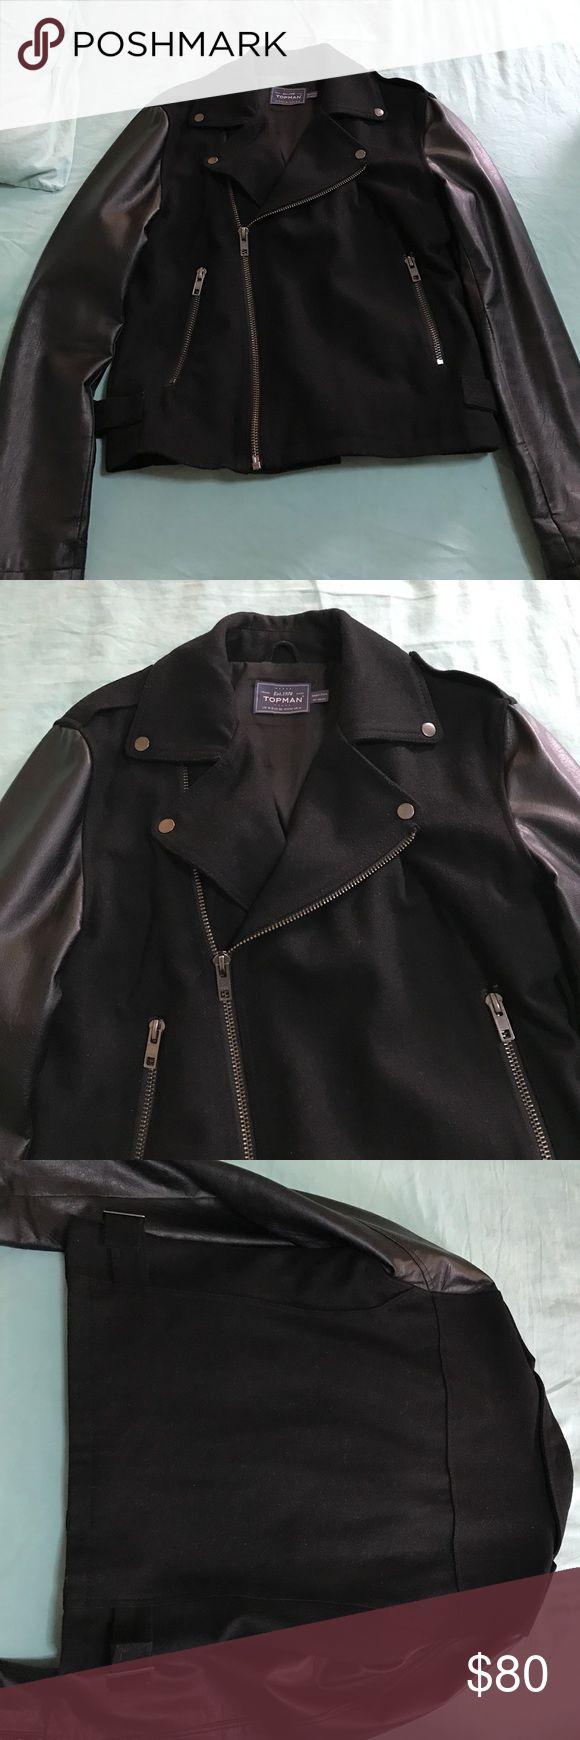 Topman Jacket Topman Medium biker wool jacket with leather sleeves. Topman Jackets & Coats Performance Jackets